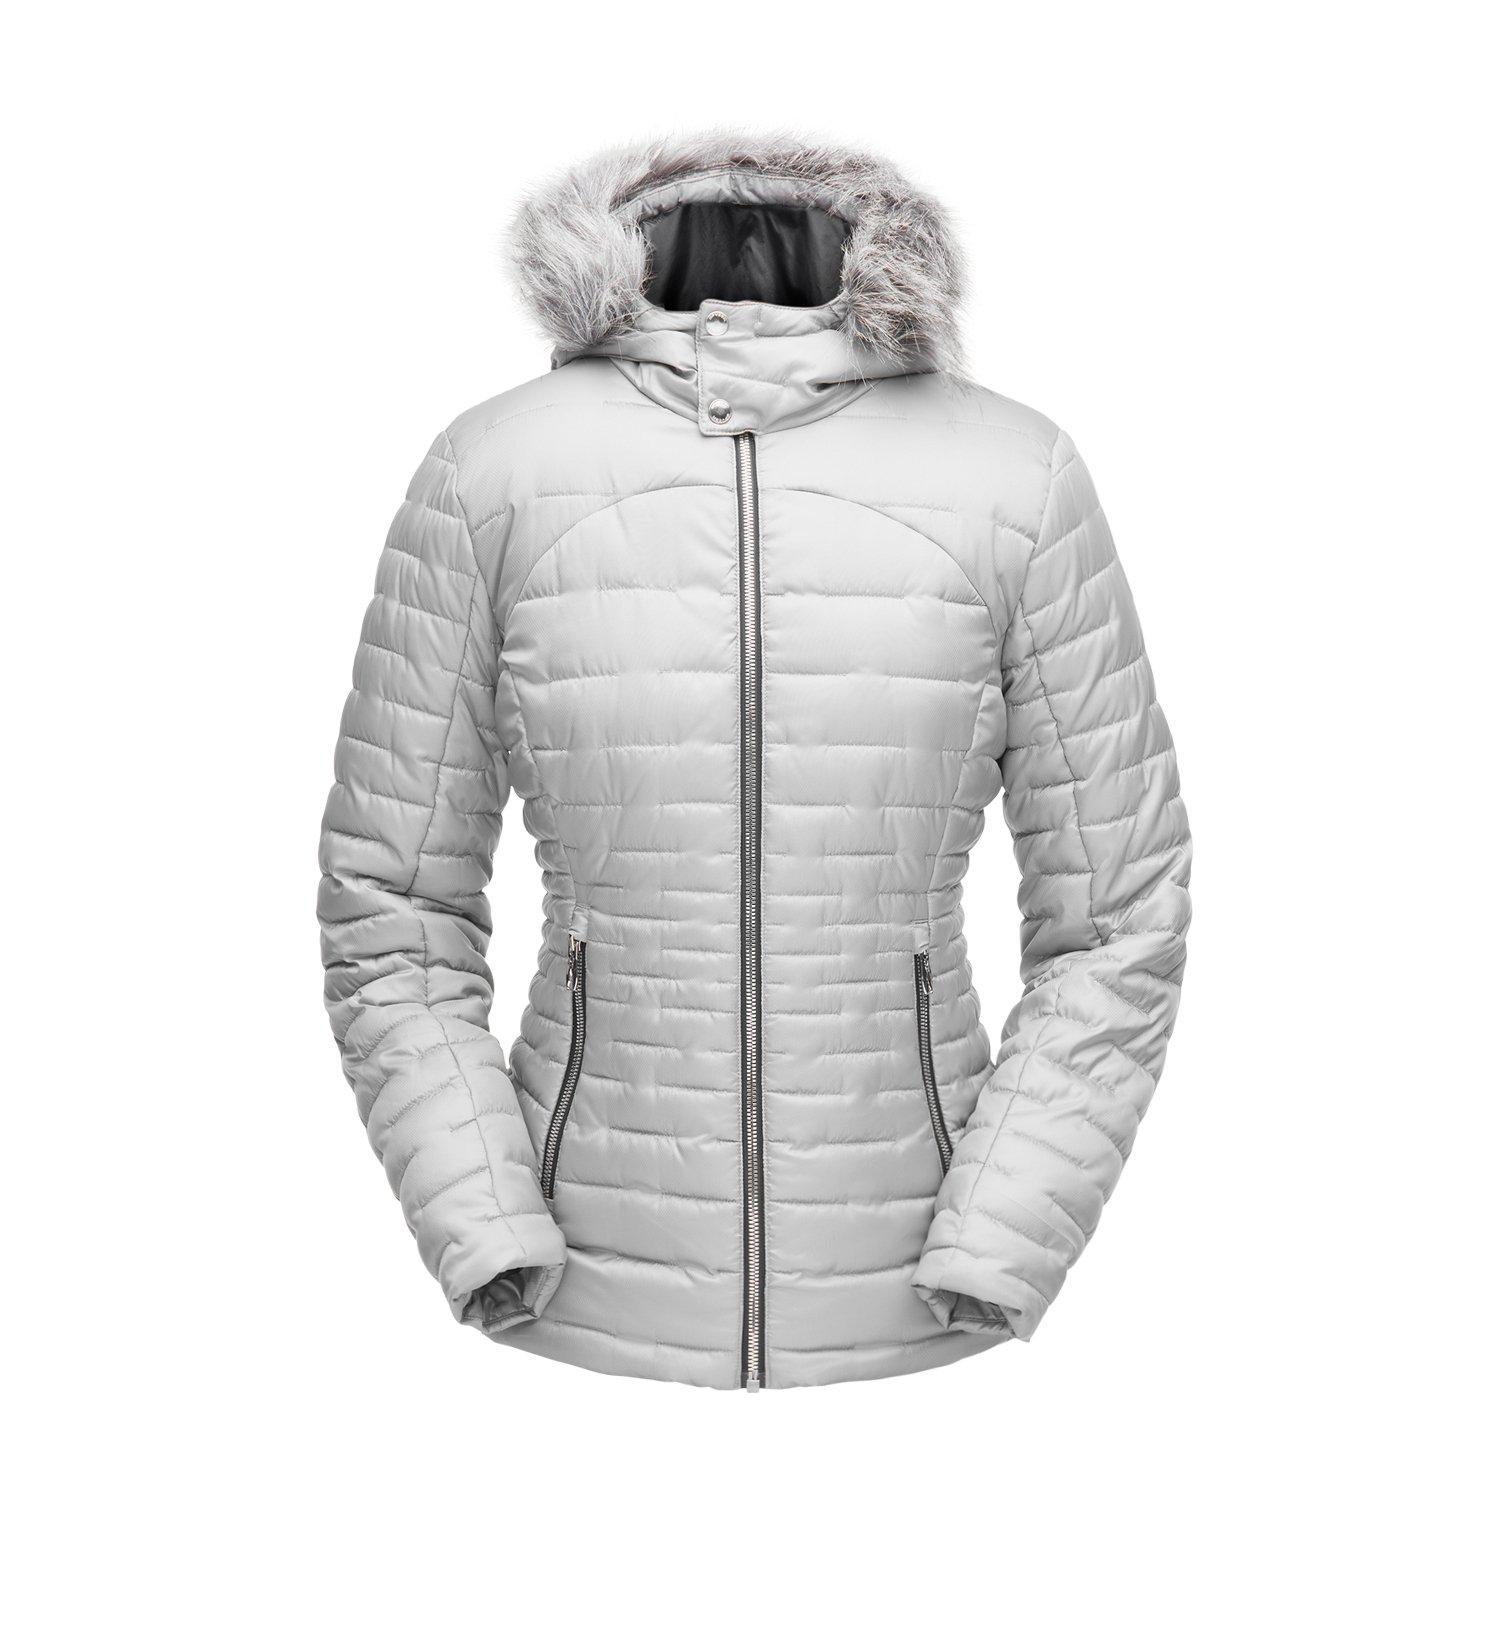 Spyder W Edyn Hoody Insulated Jacket